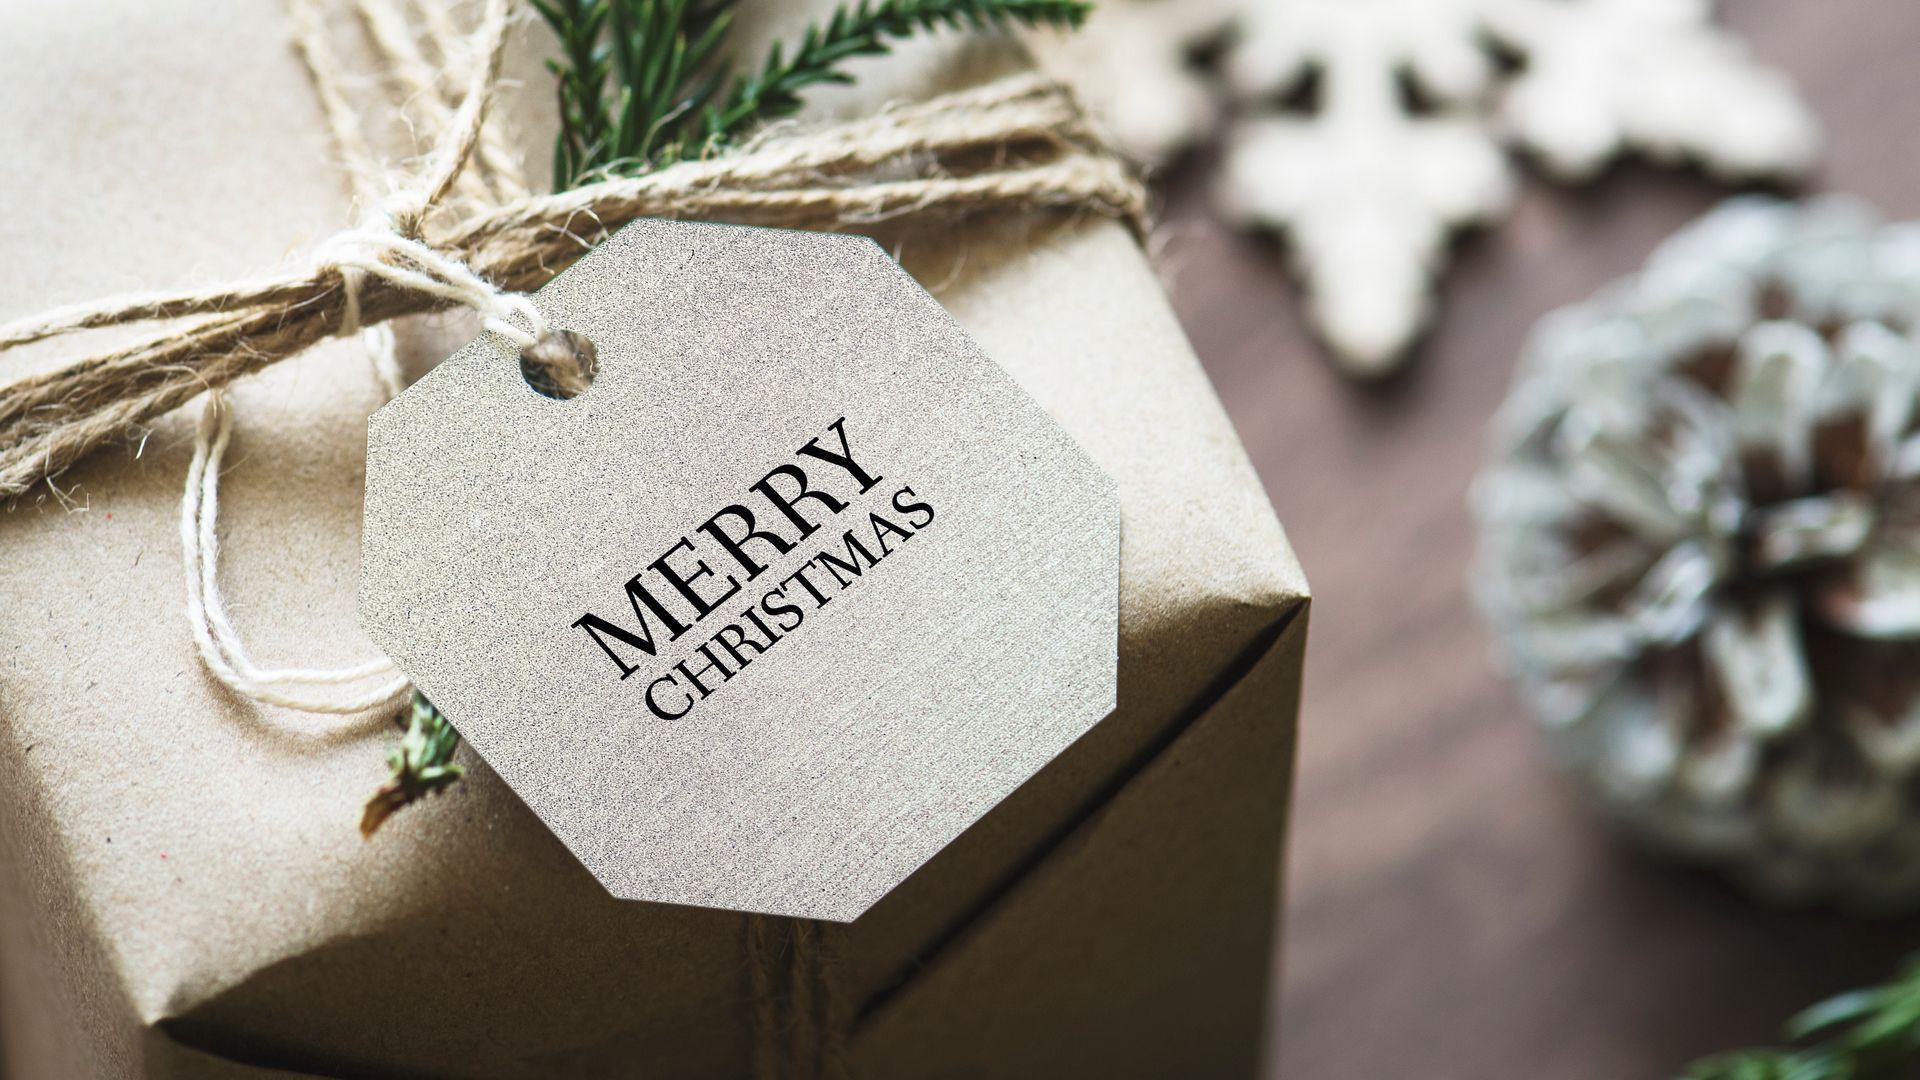 1920x1080 Wallpaper gift, christmas, new year, tag, box